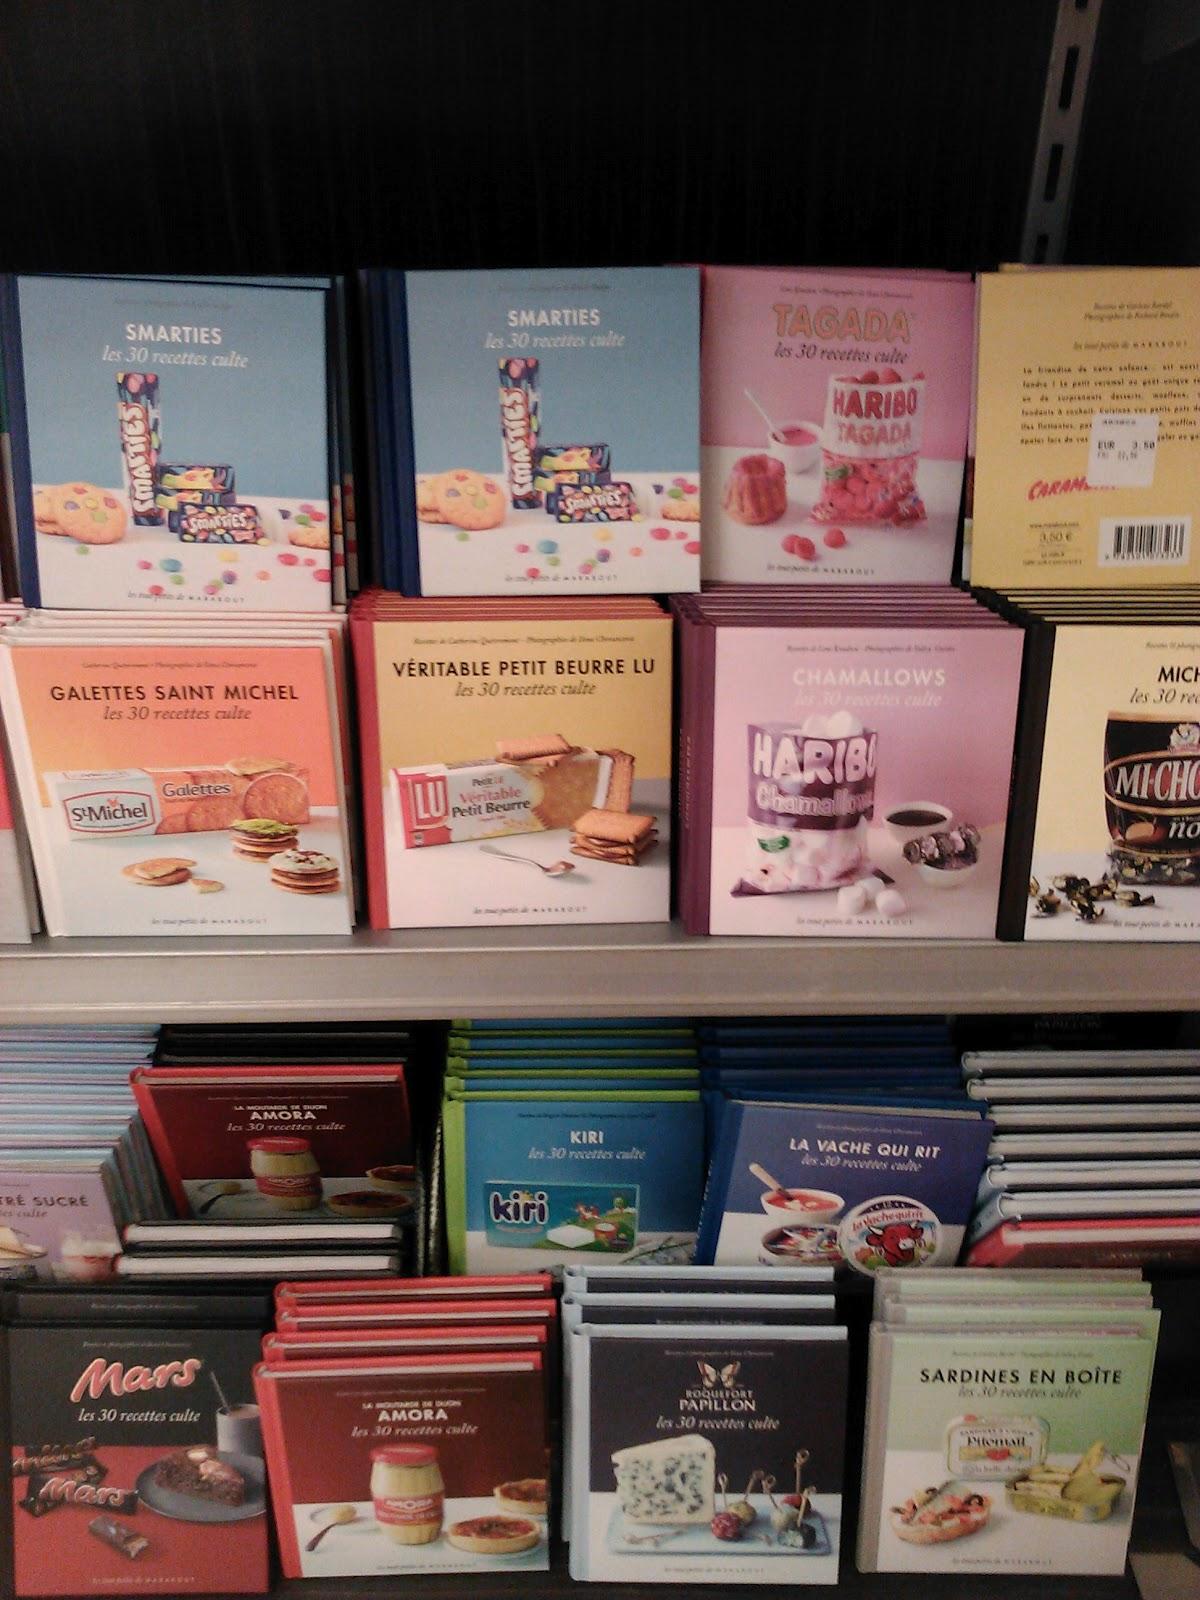 From soph to you cuisine hautement r gressive - Livre cuisine marque culte ...